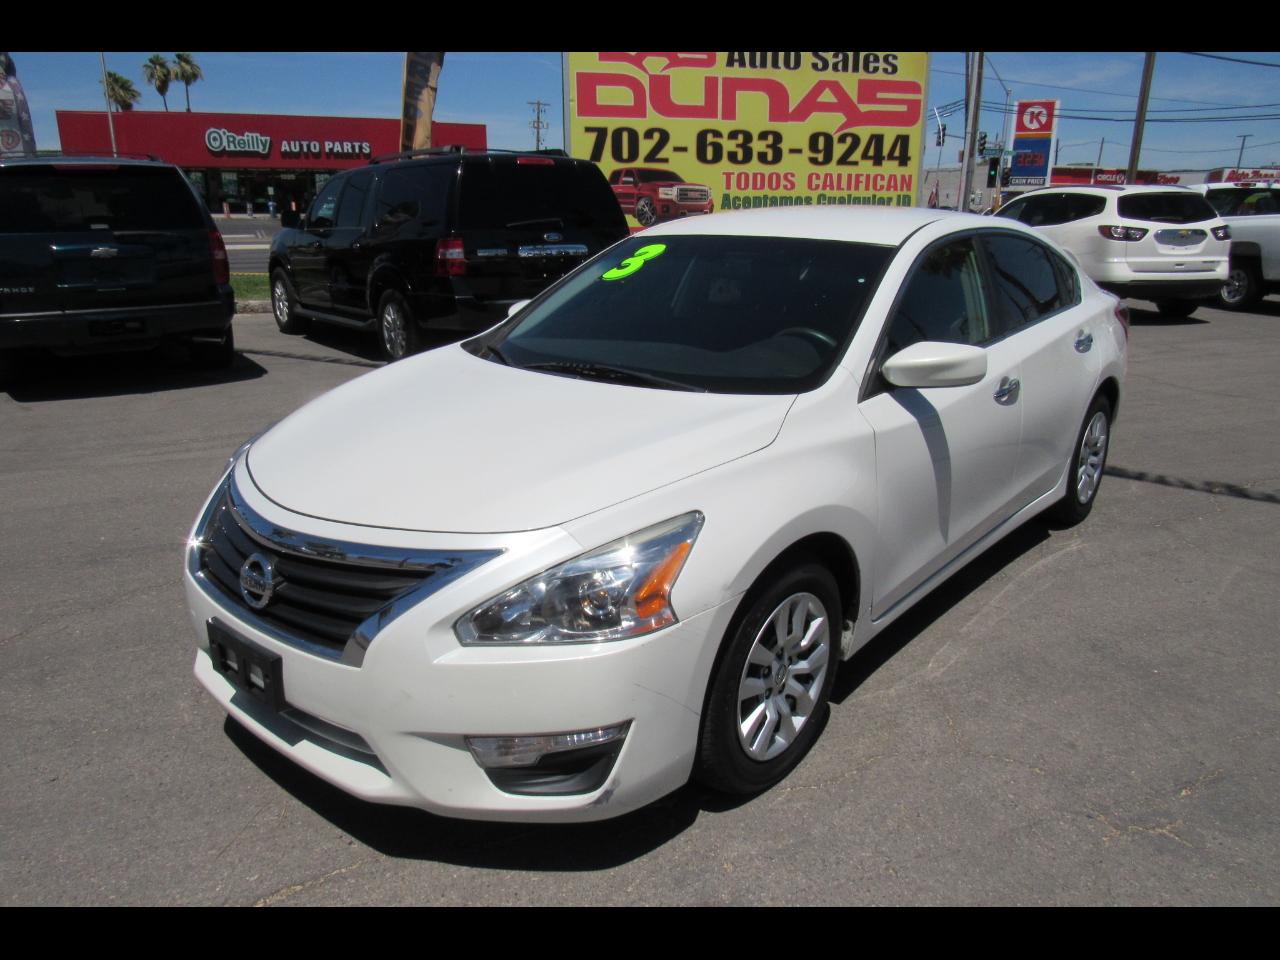 Used 2013 Nissan Altima for Sale in Las Vegas, NV 89101 Las